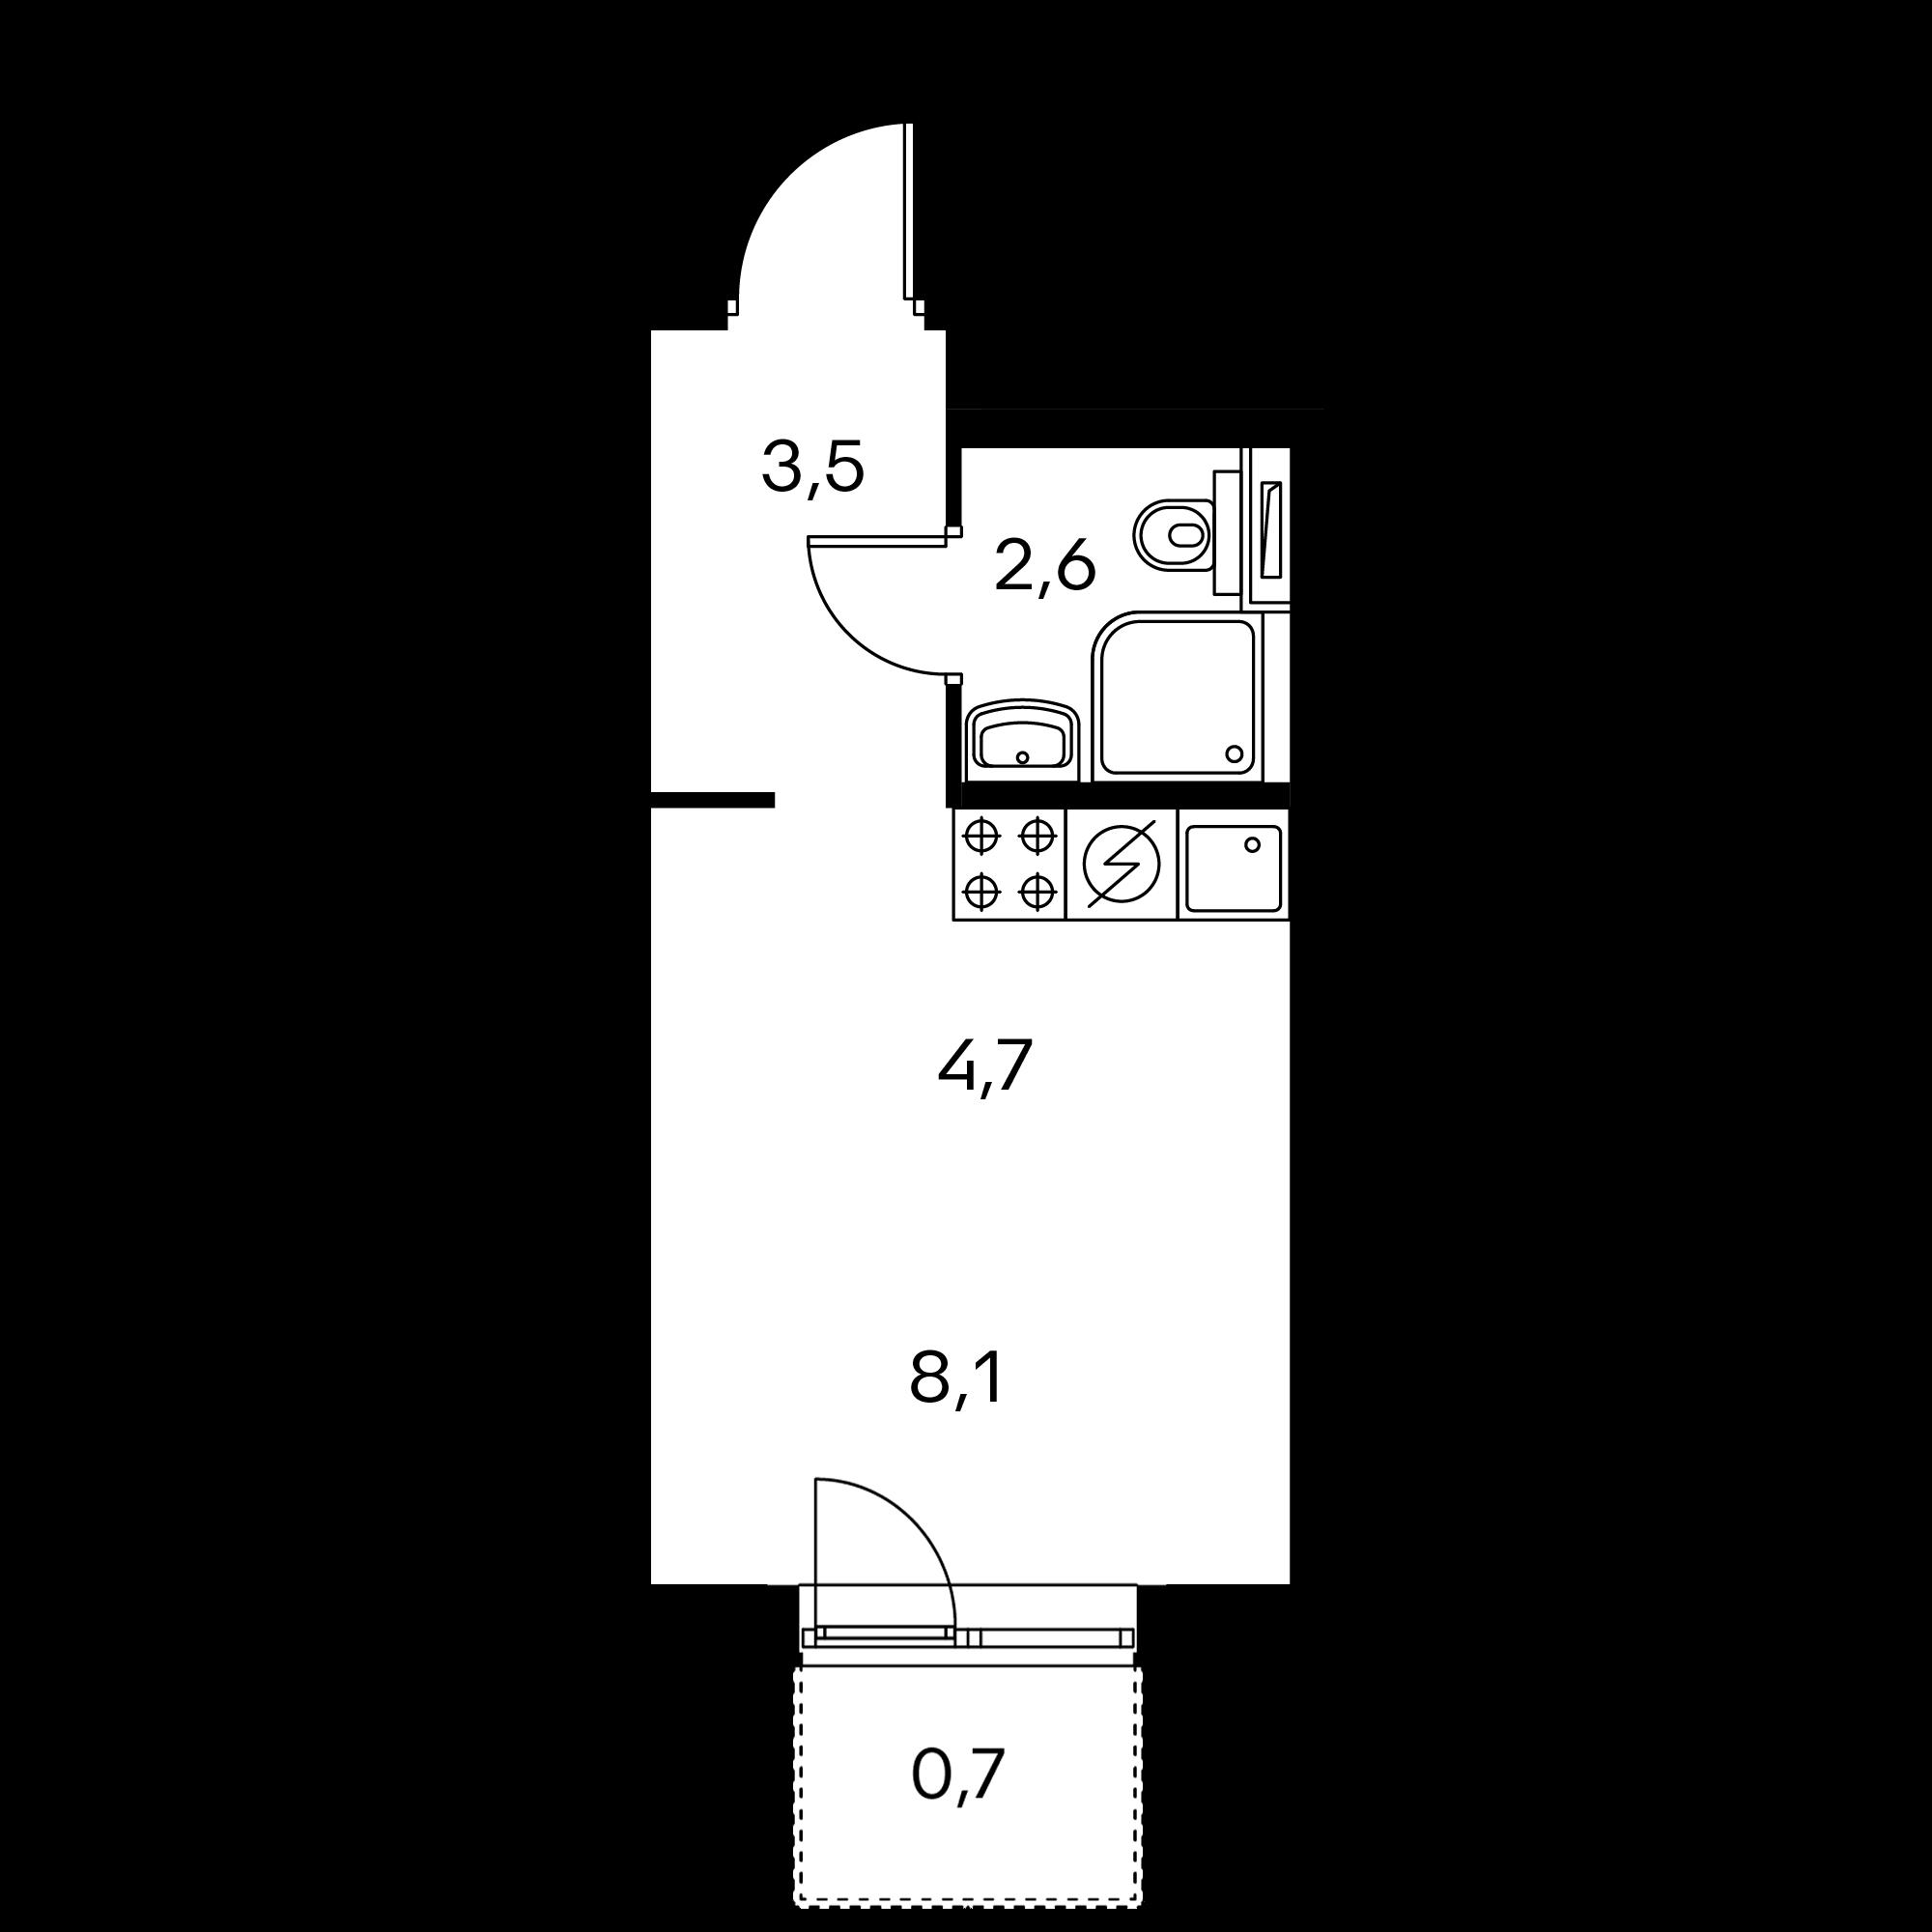 1NS1_4.2-1SZB